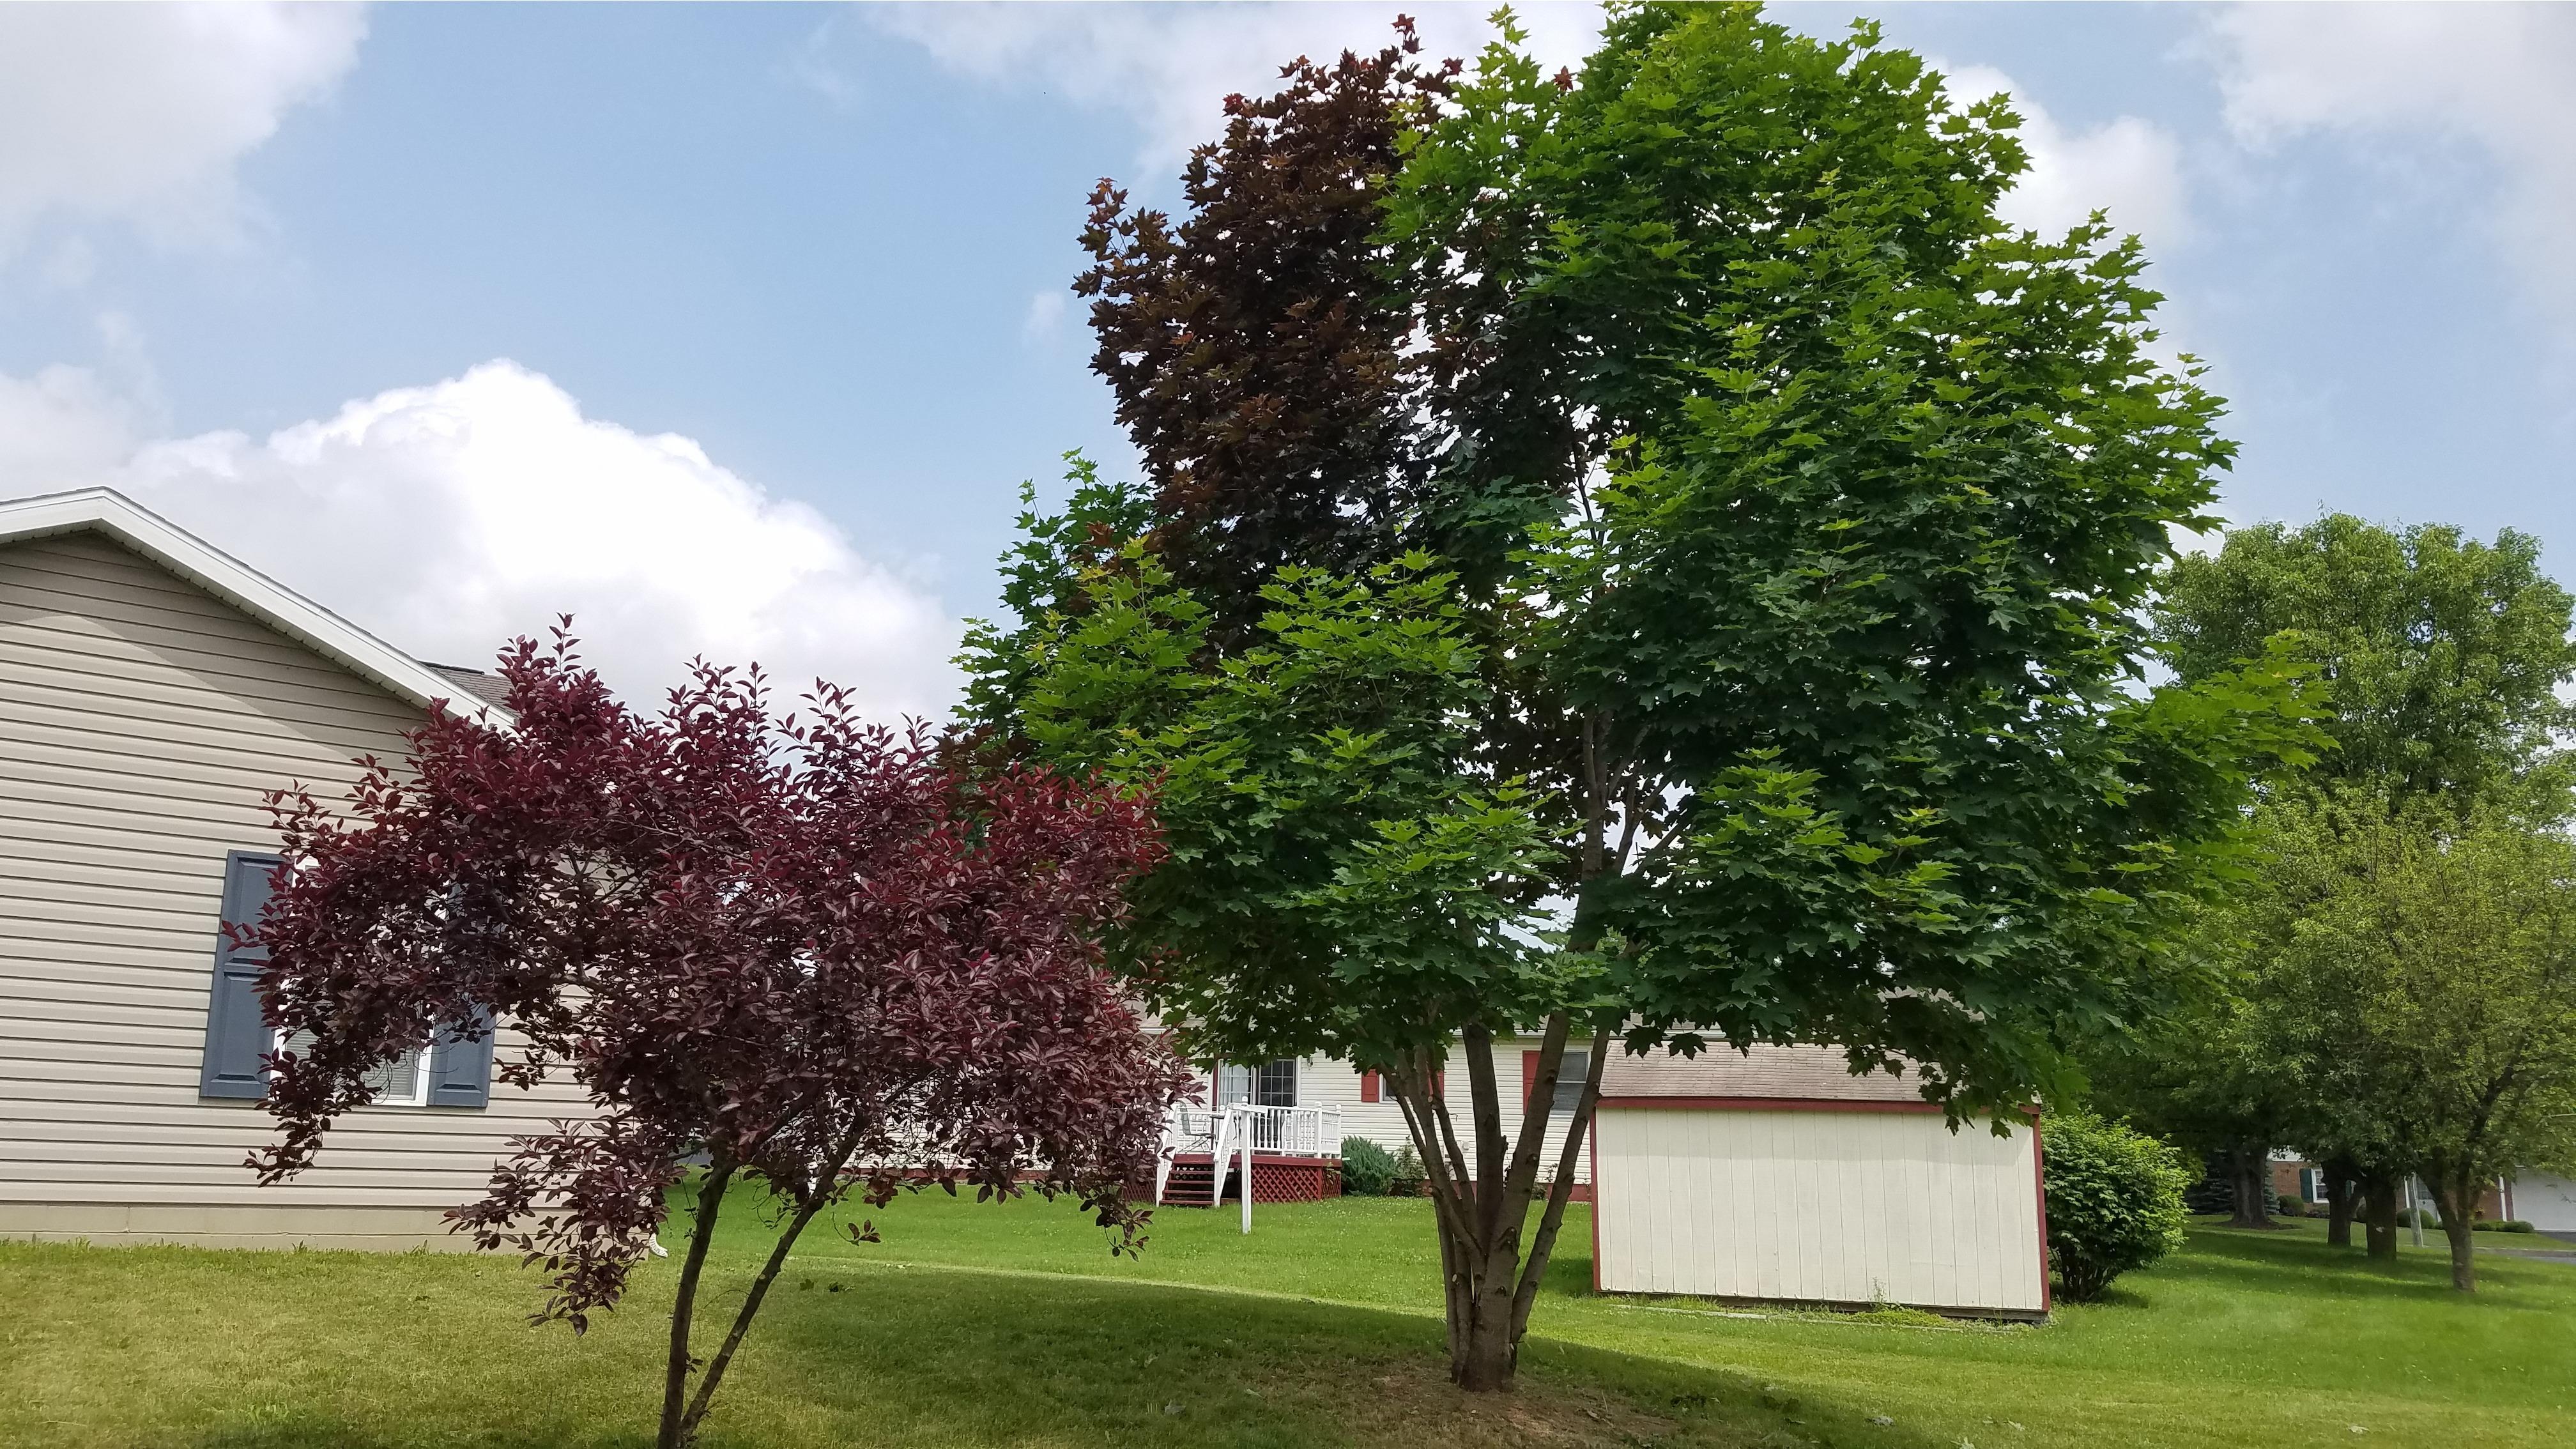 No Sweat Lawns & Trees, LLC image 0